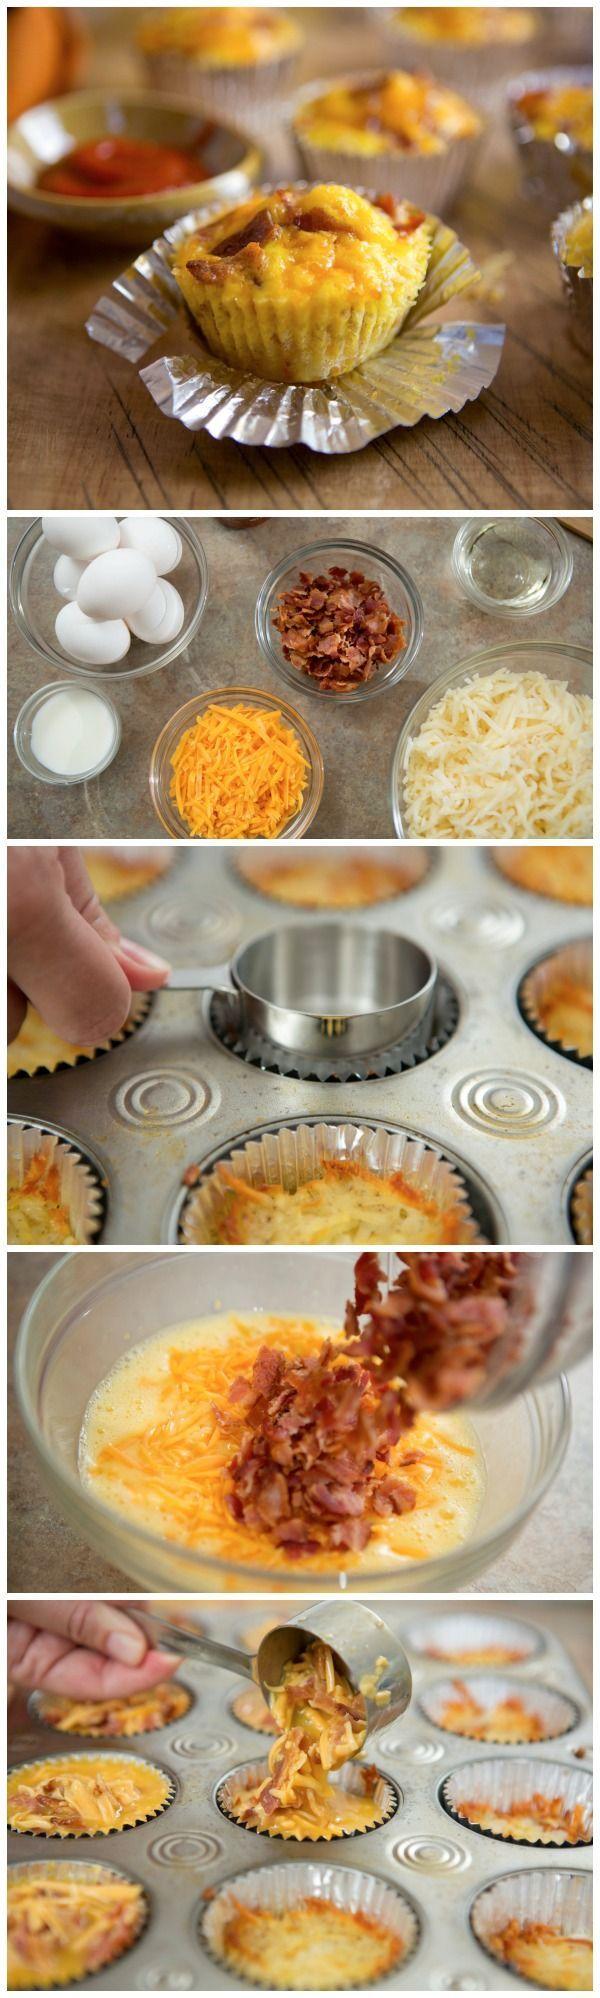 Potato Bacon and Egg Cupcakes Breakfast